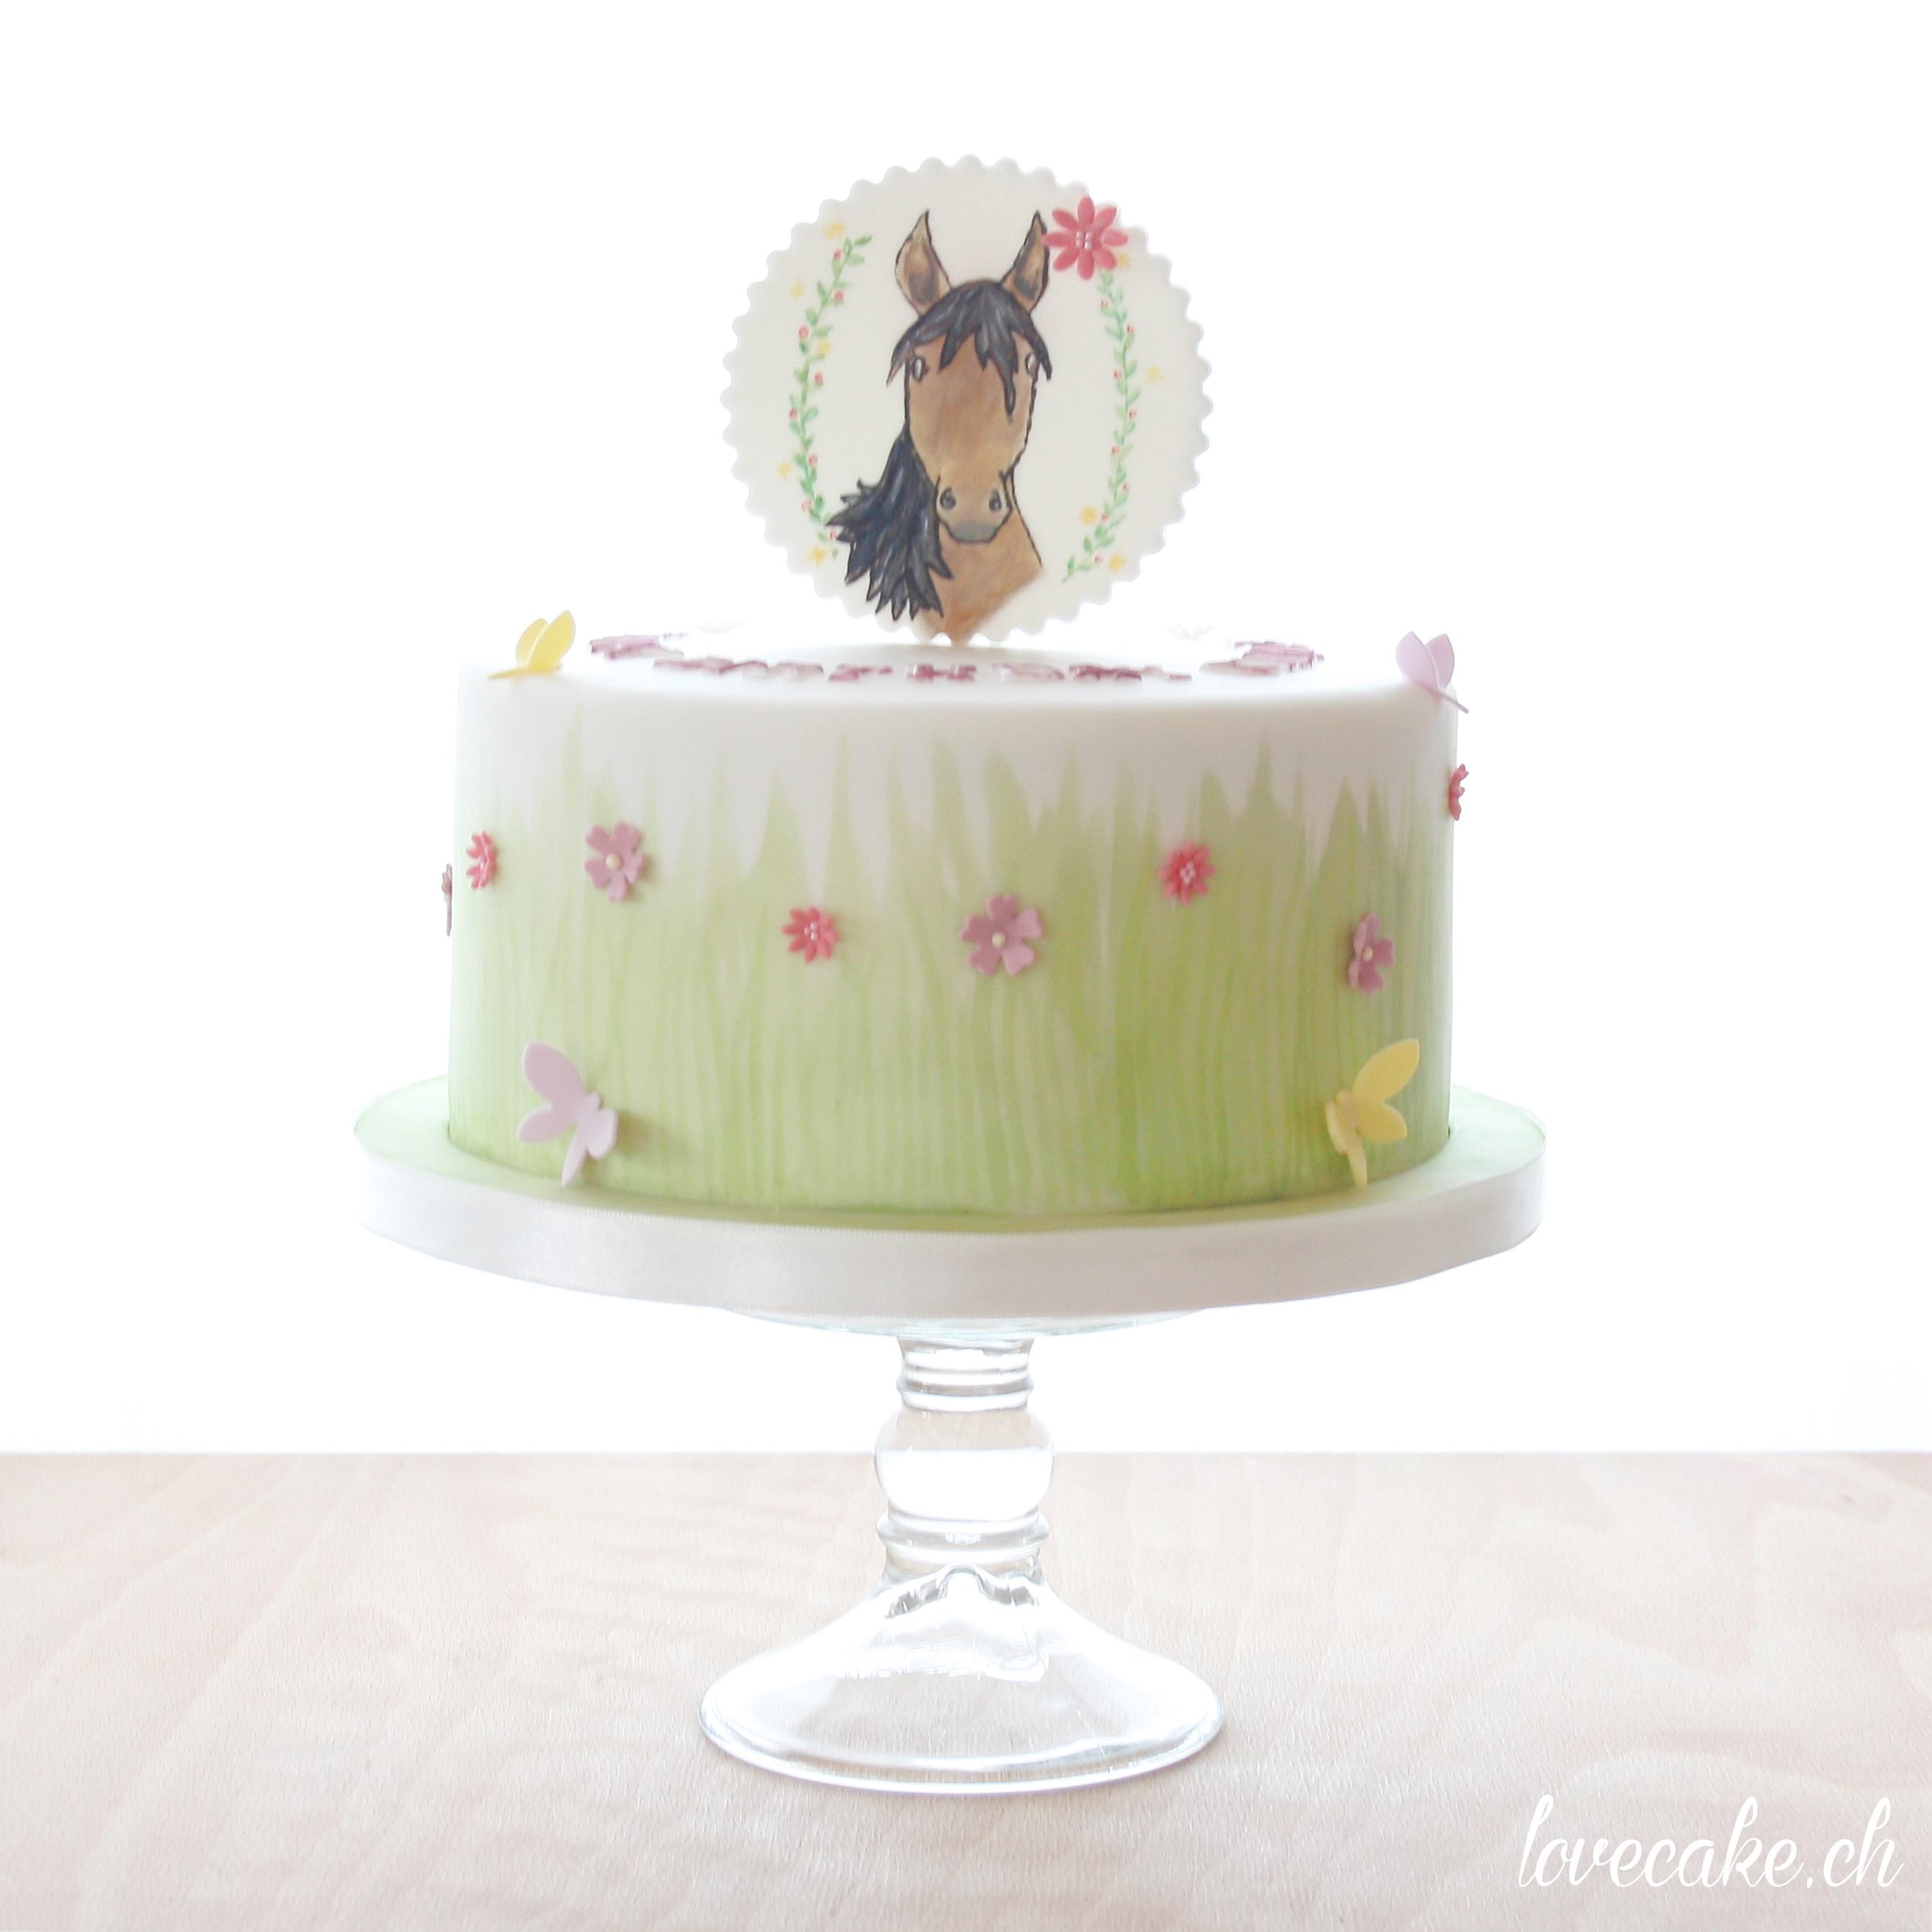 Mini horse themed birthday cake